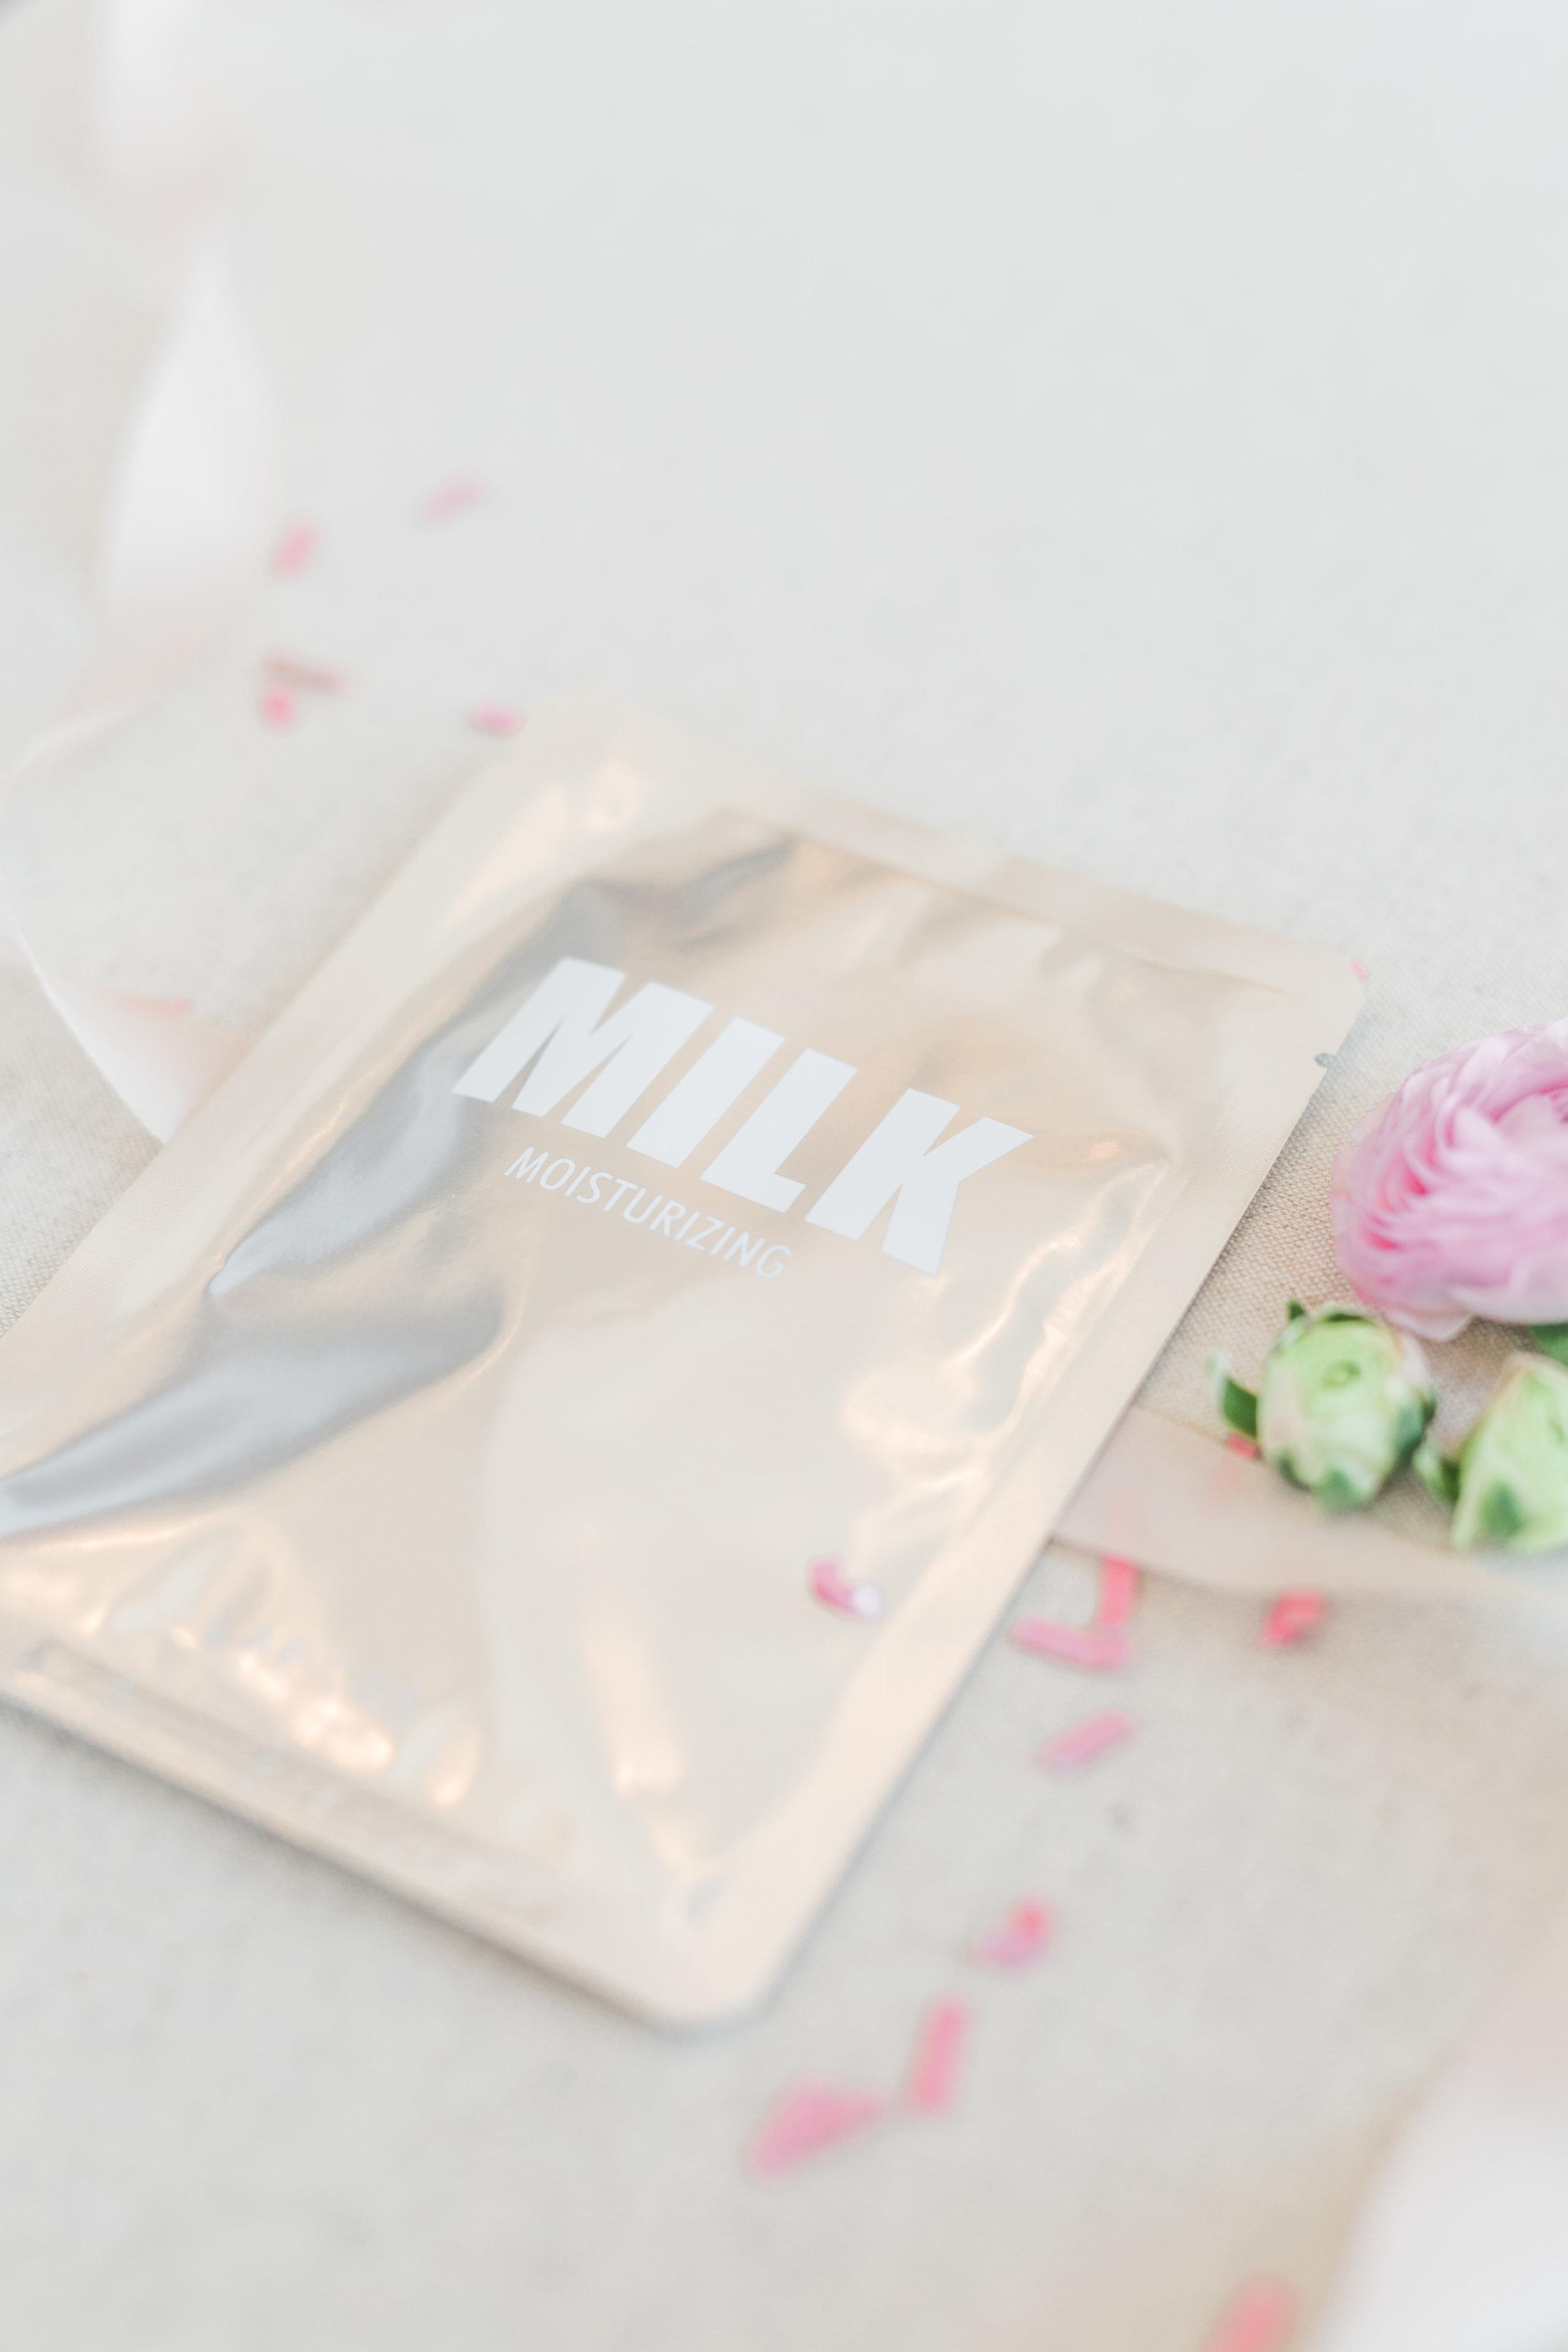 Milk Moisturizing Face Mask by Lapos